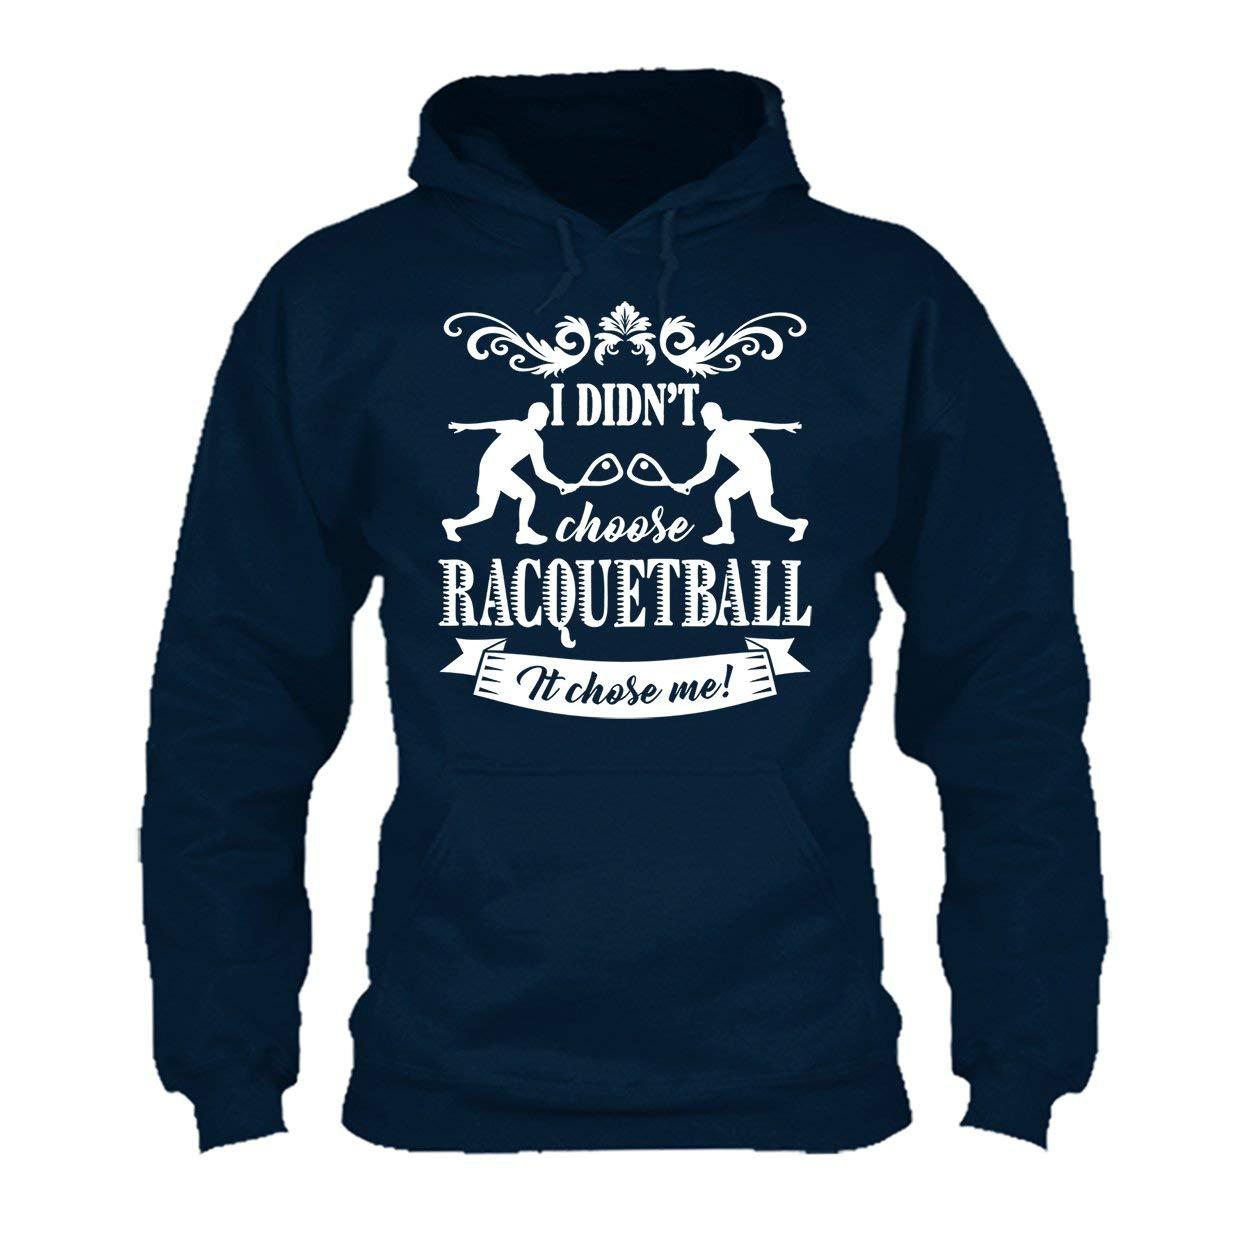 Hoodies Racquetball Chose Me Tee Shirt Shirt